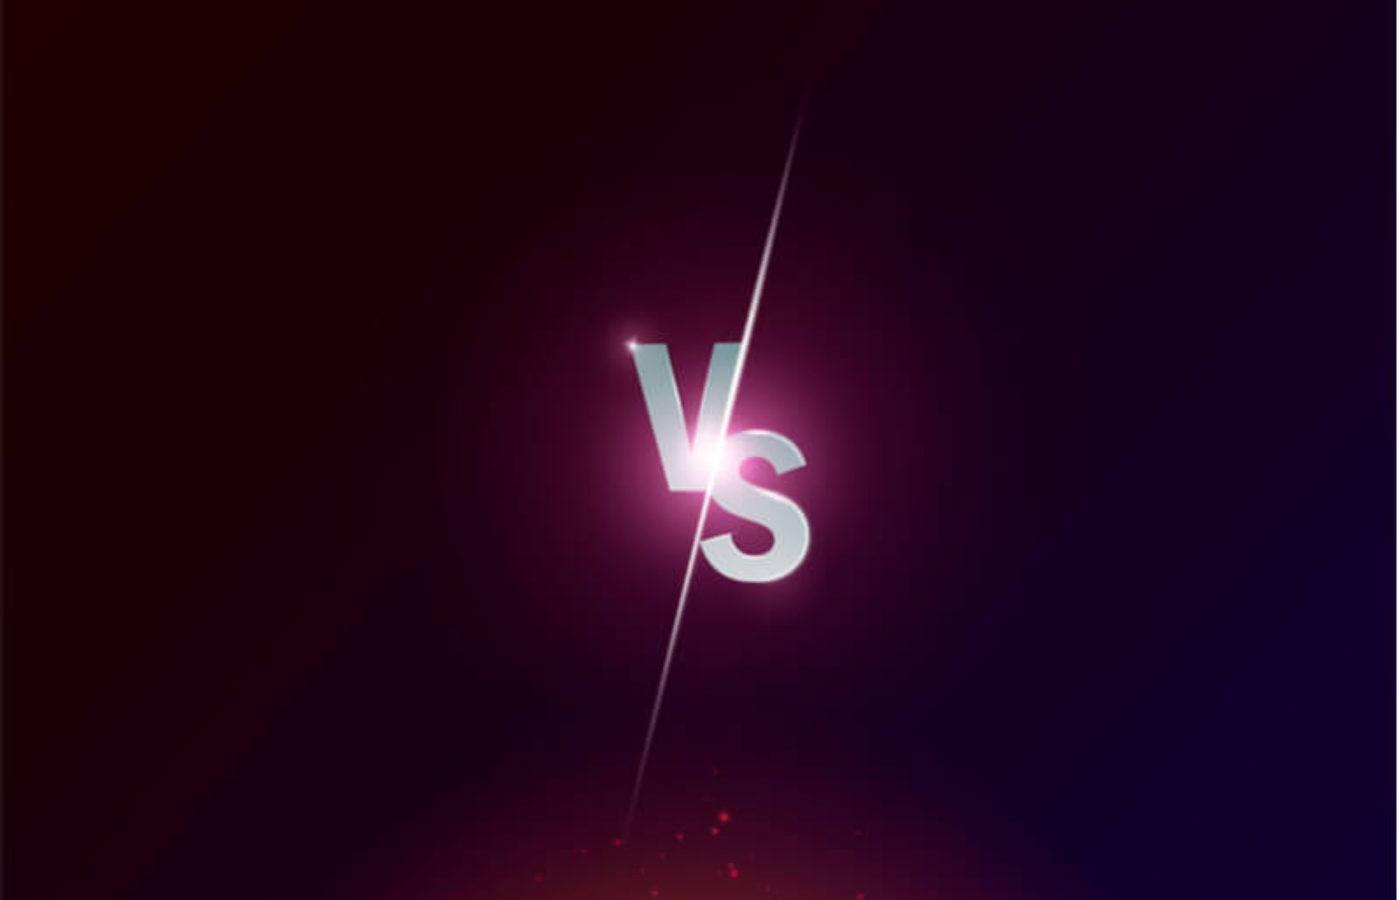 awb vs consol